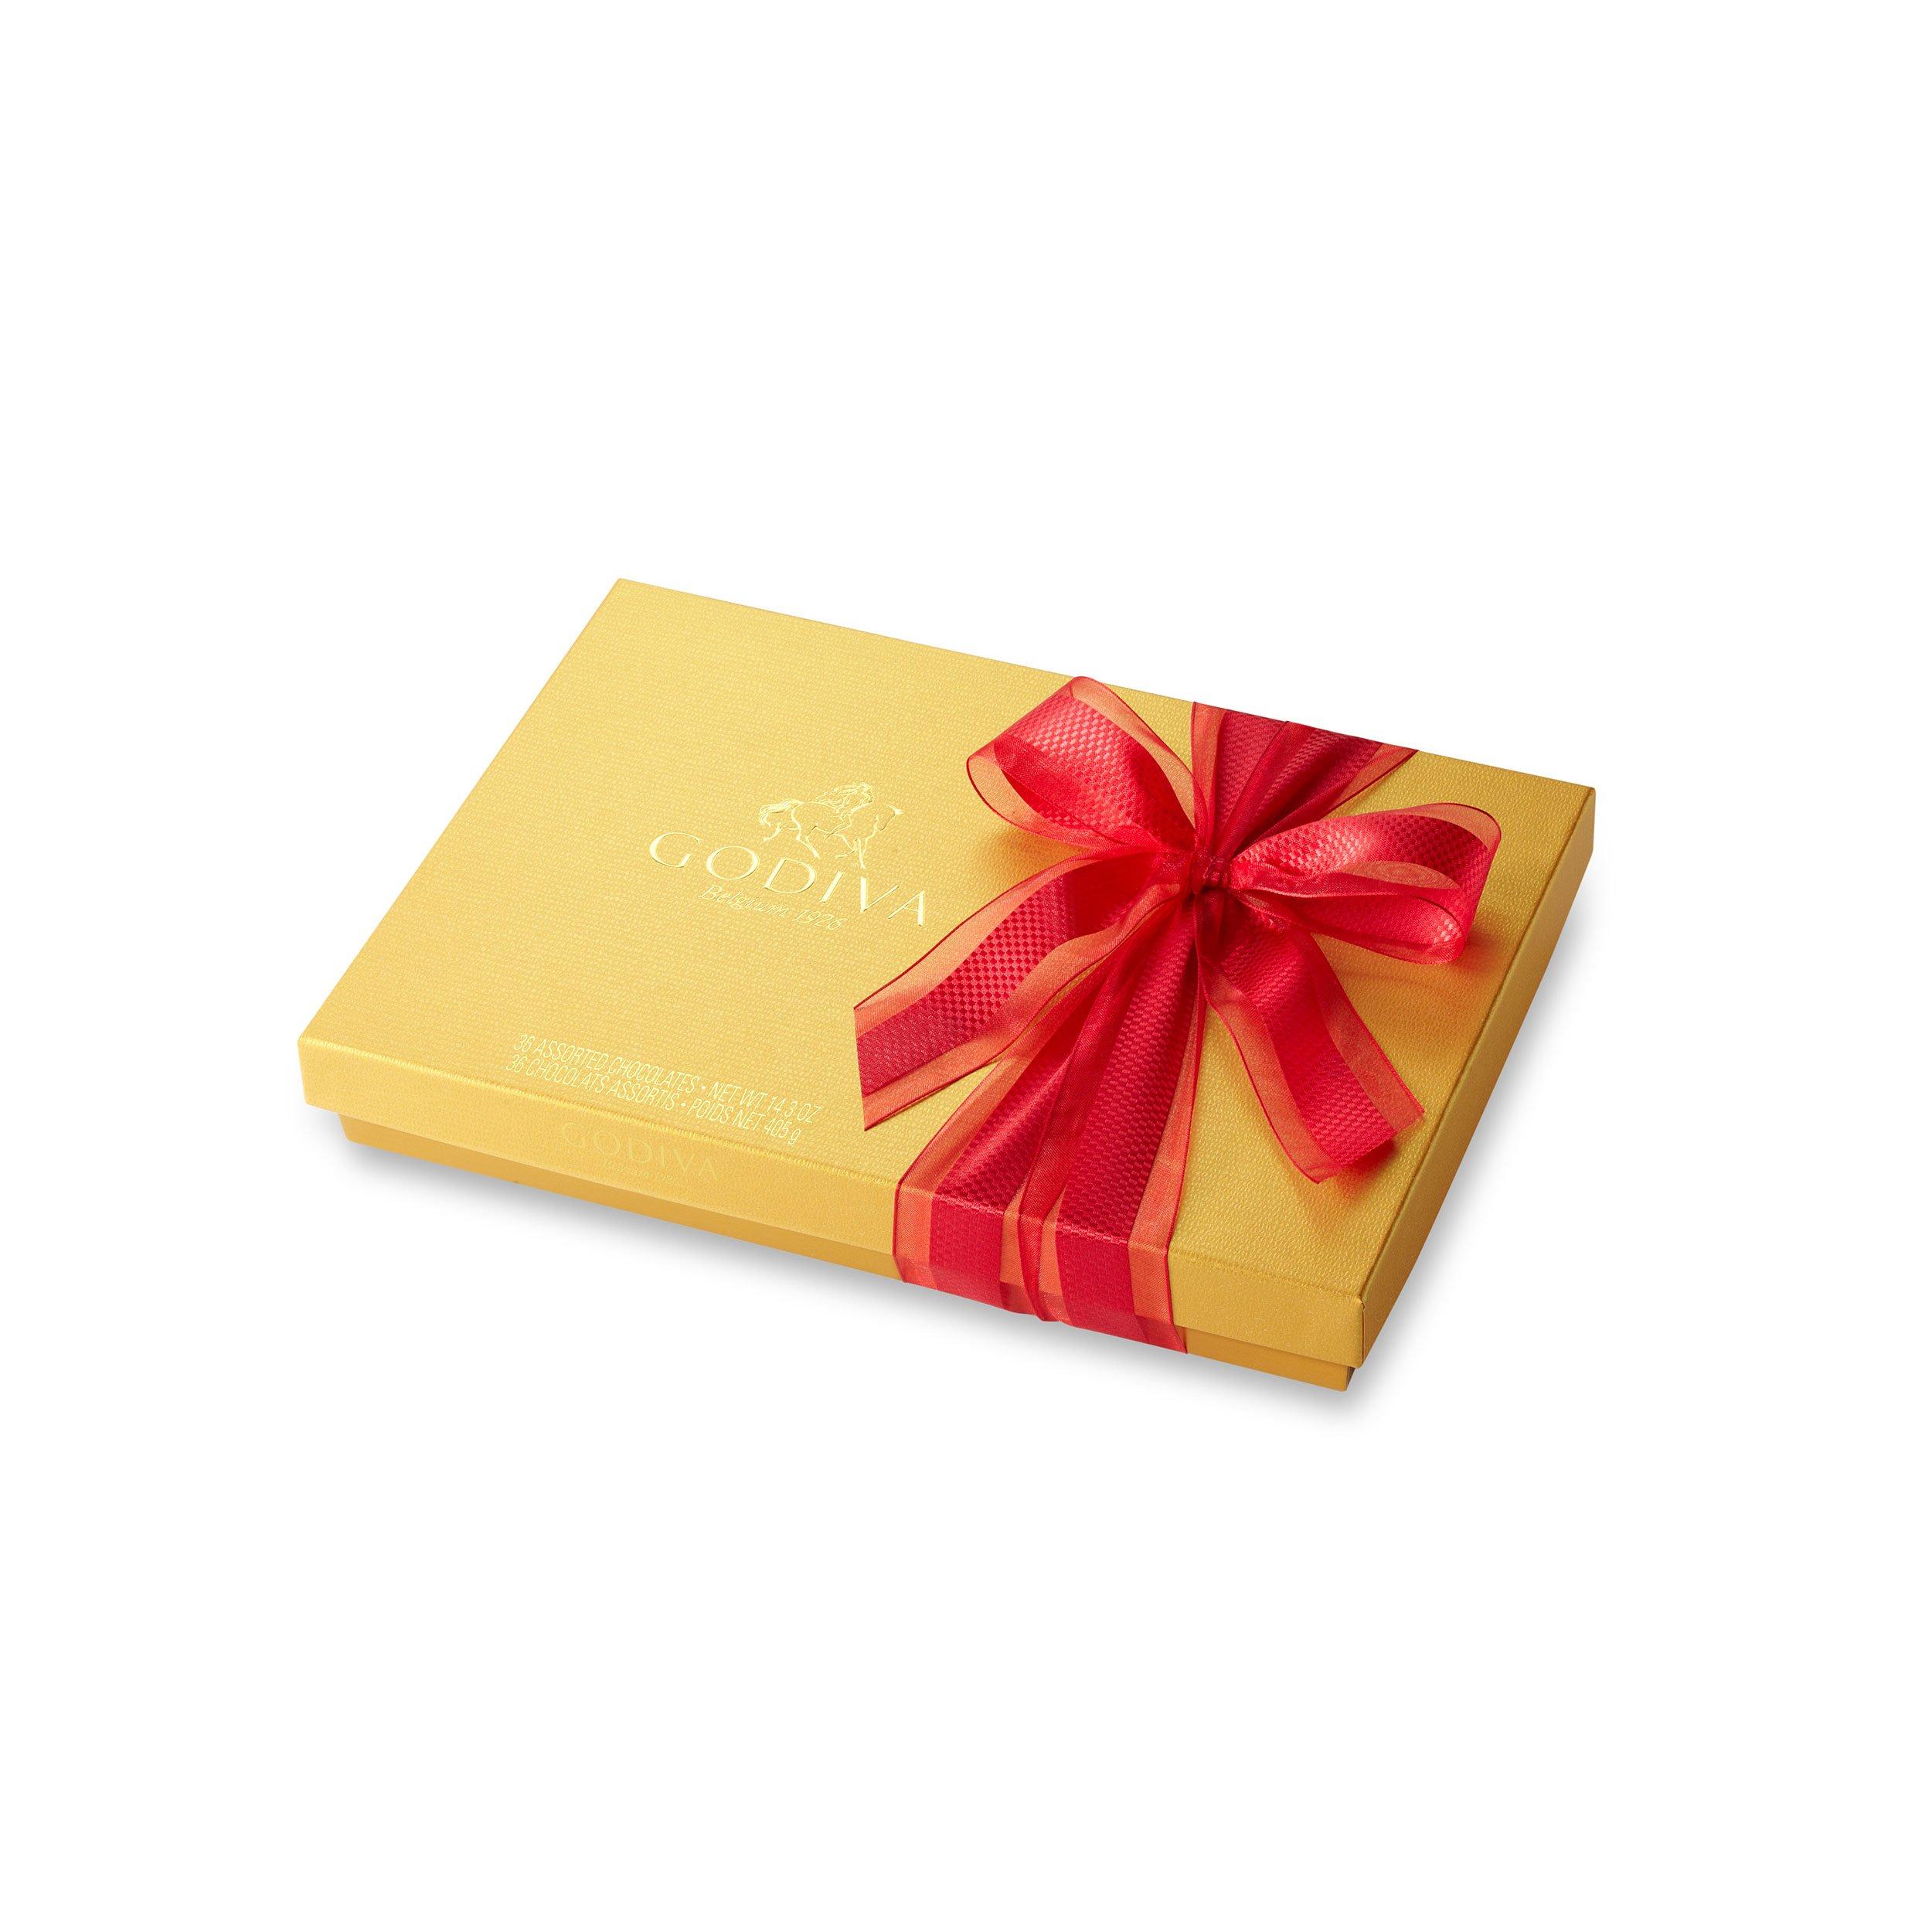 Godiva Chocolatier Gold Ballotin Assorted Gourmet Chocolates 36 Piece Gift Box, Great for Gifting by GODIVA Chocolatier (Image #2)